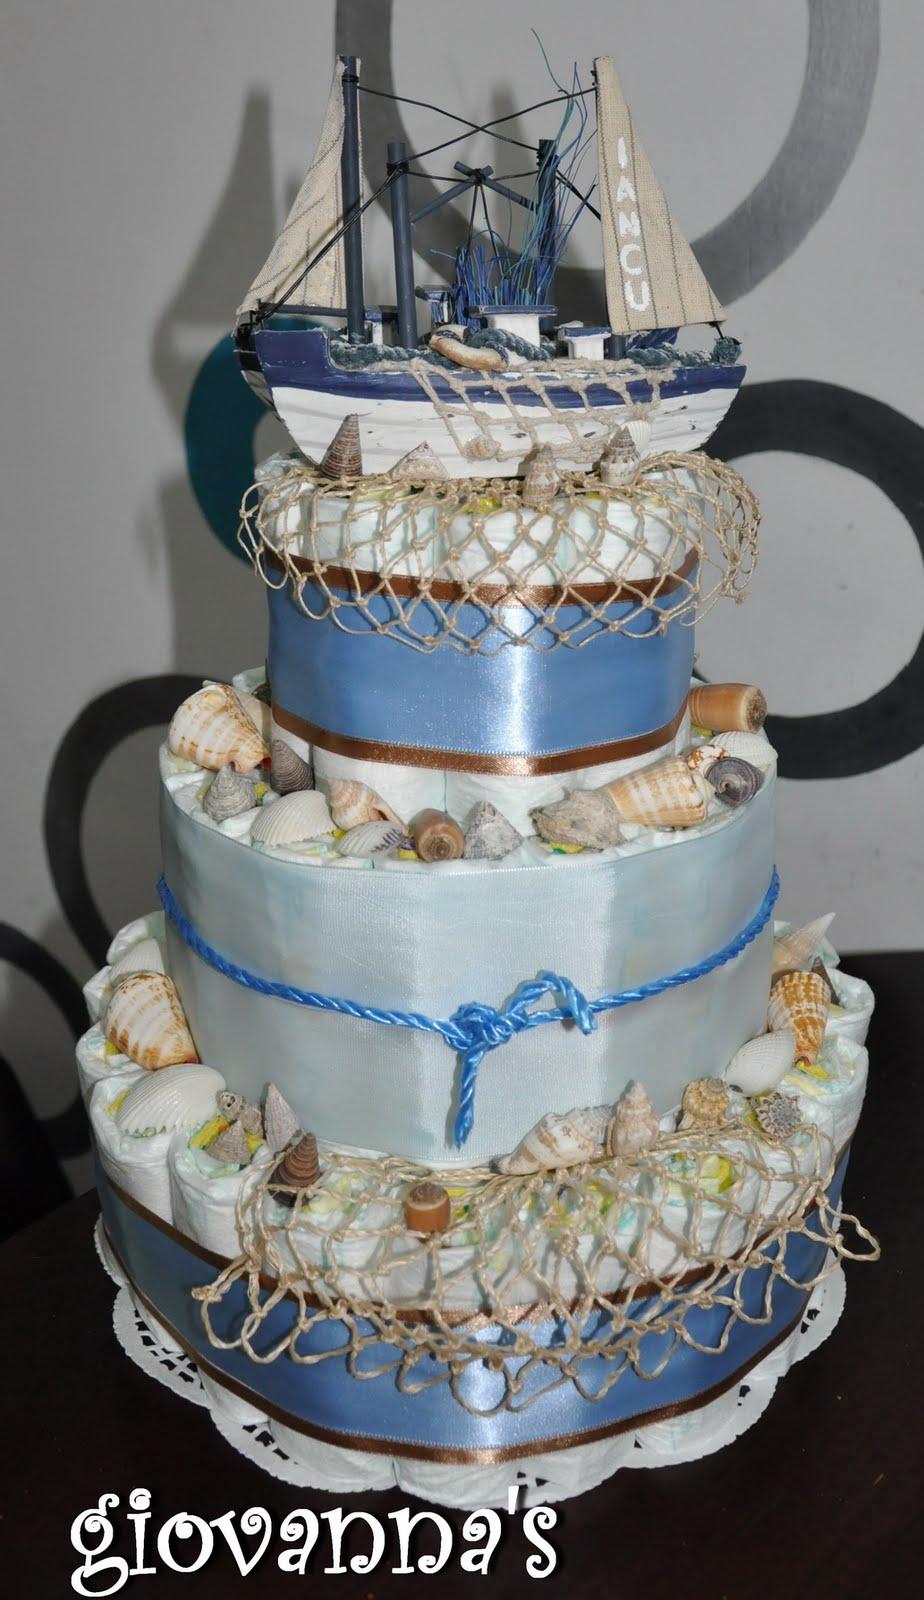 giovanna's cakes: latest diaper cakes